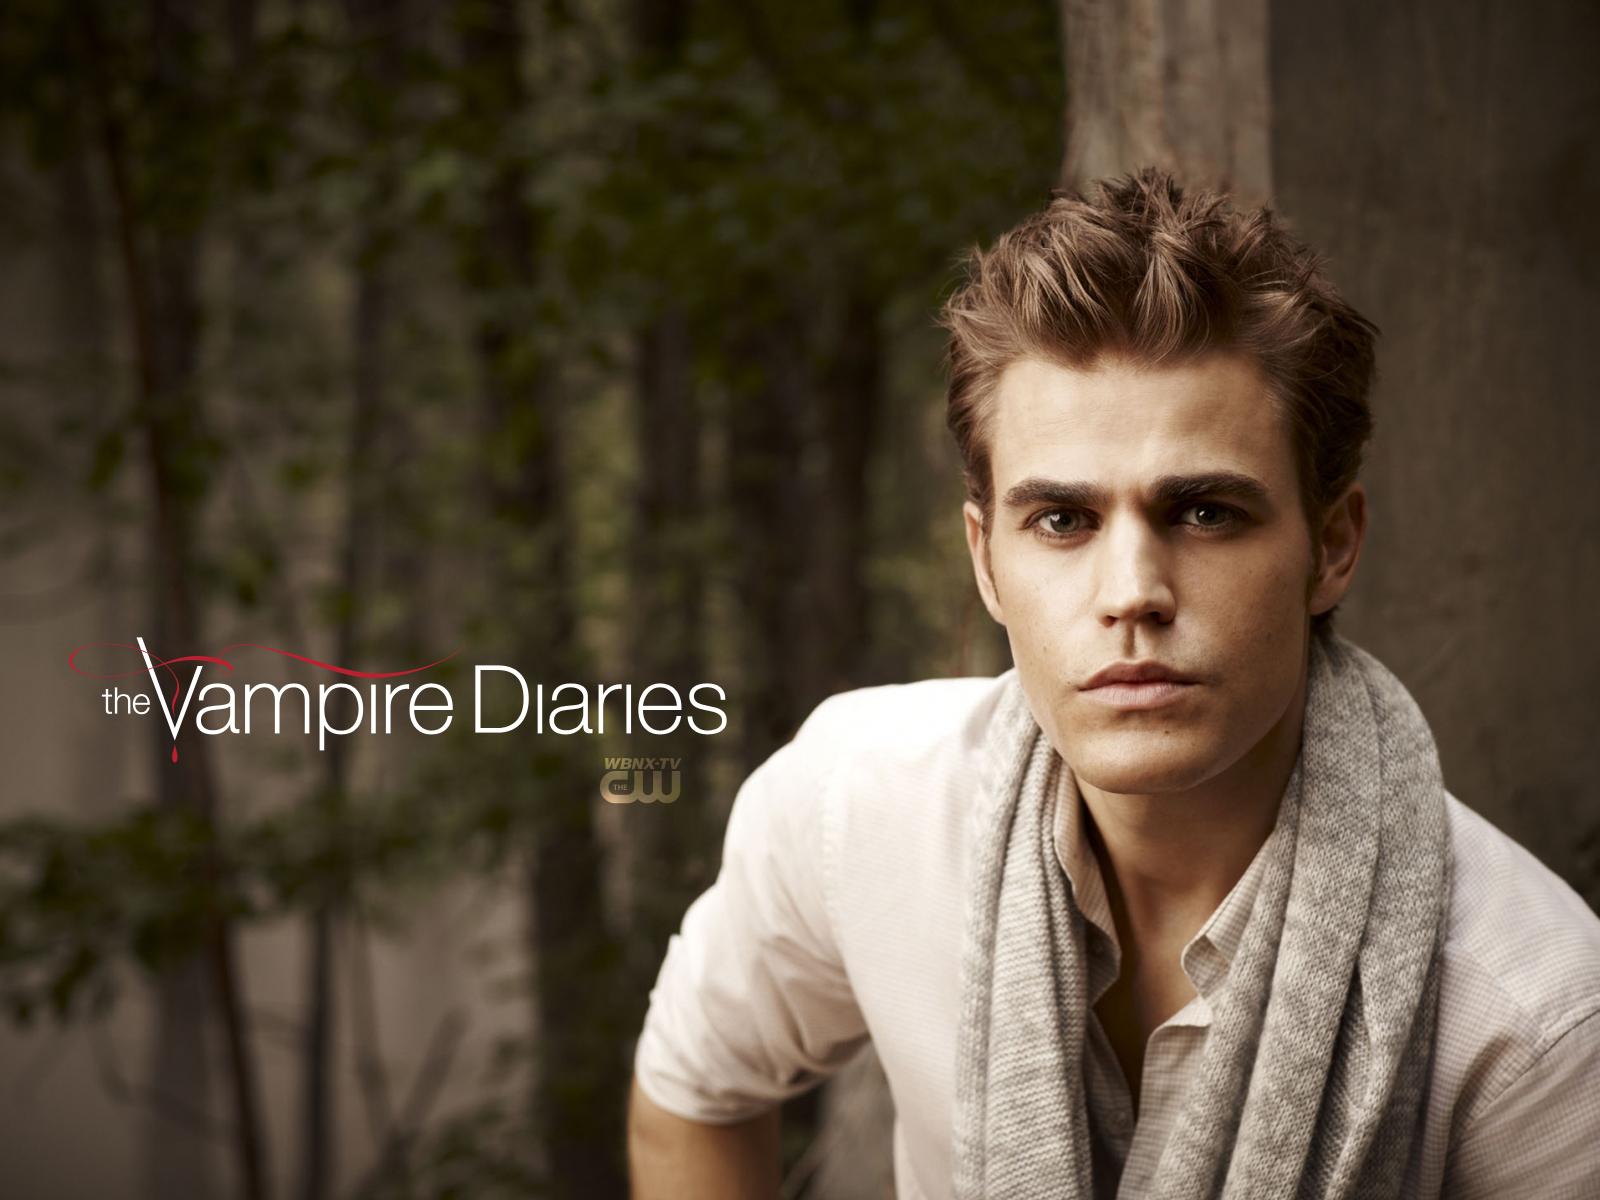 Damon Salvatore The Vampire Diaries Exclusive HD Wallpapers 1441 1600x1200